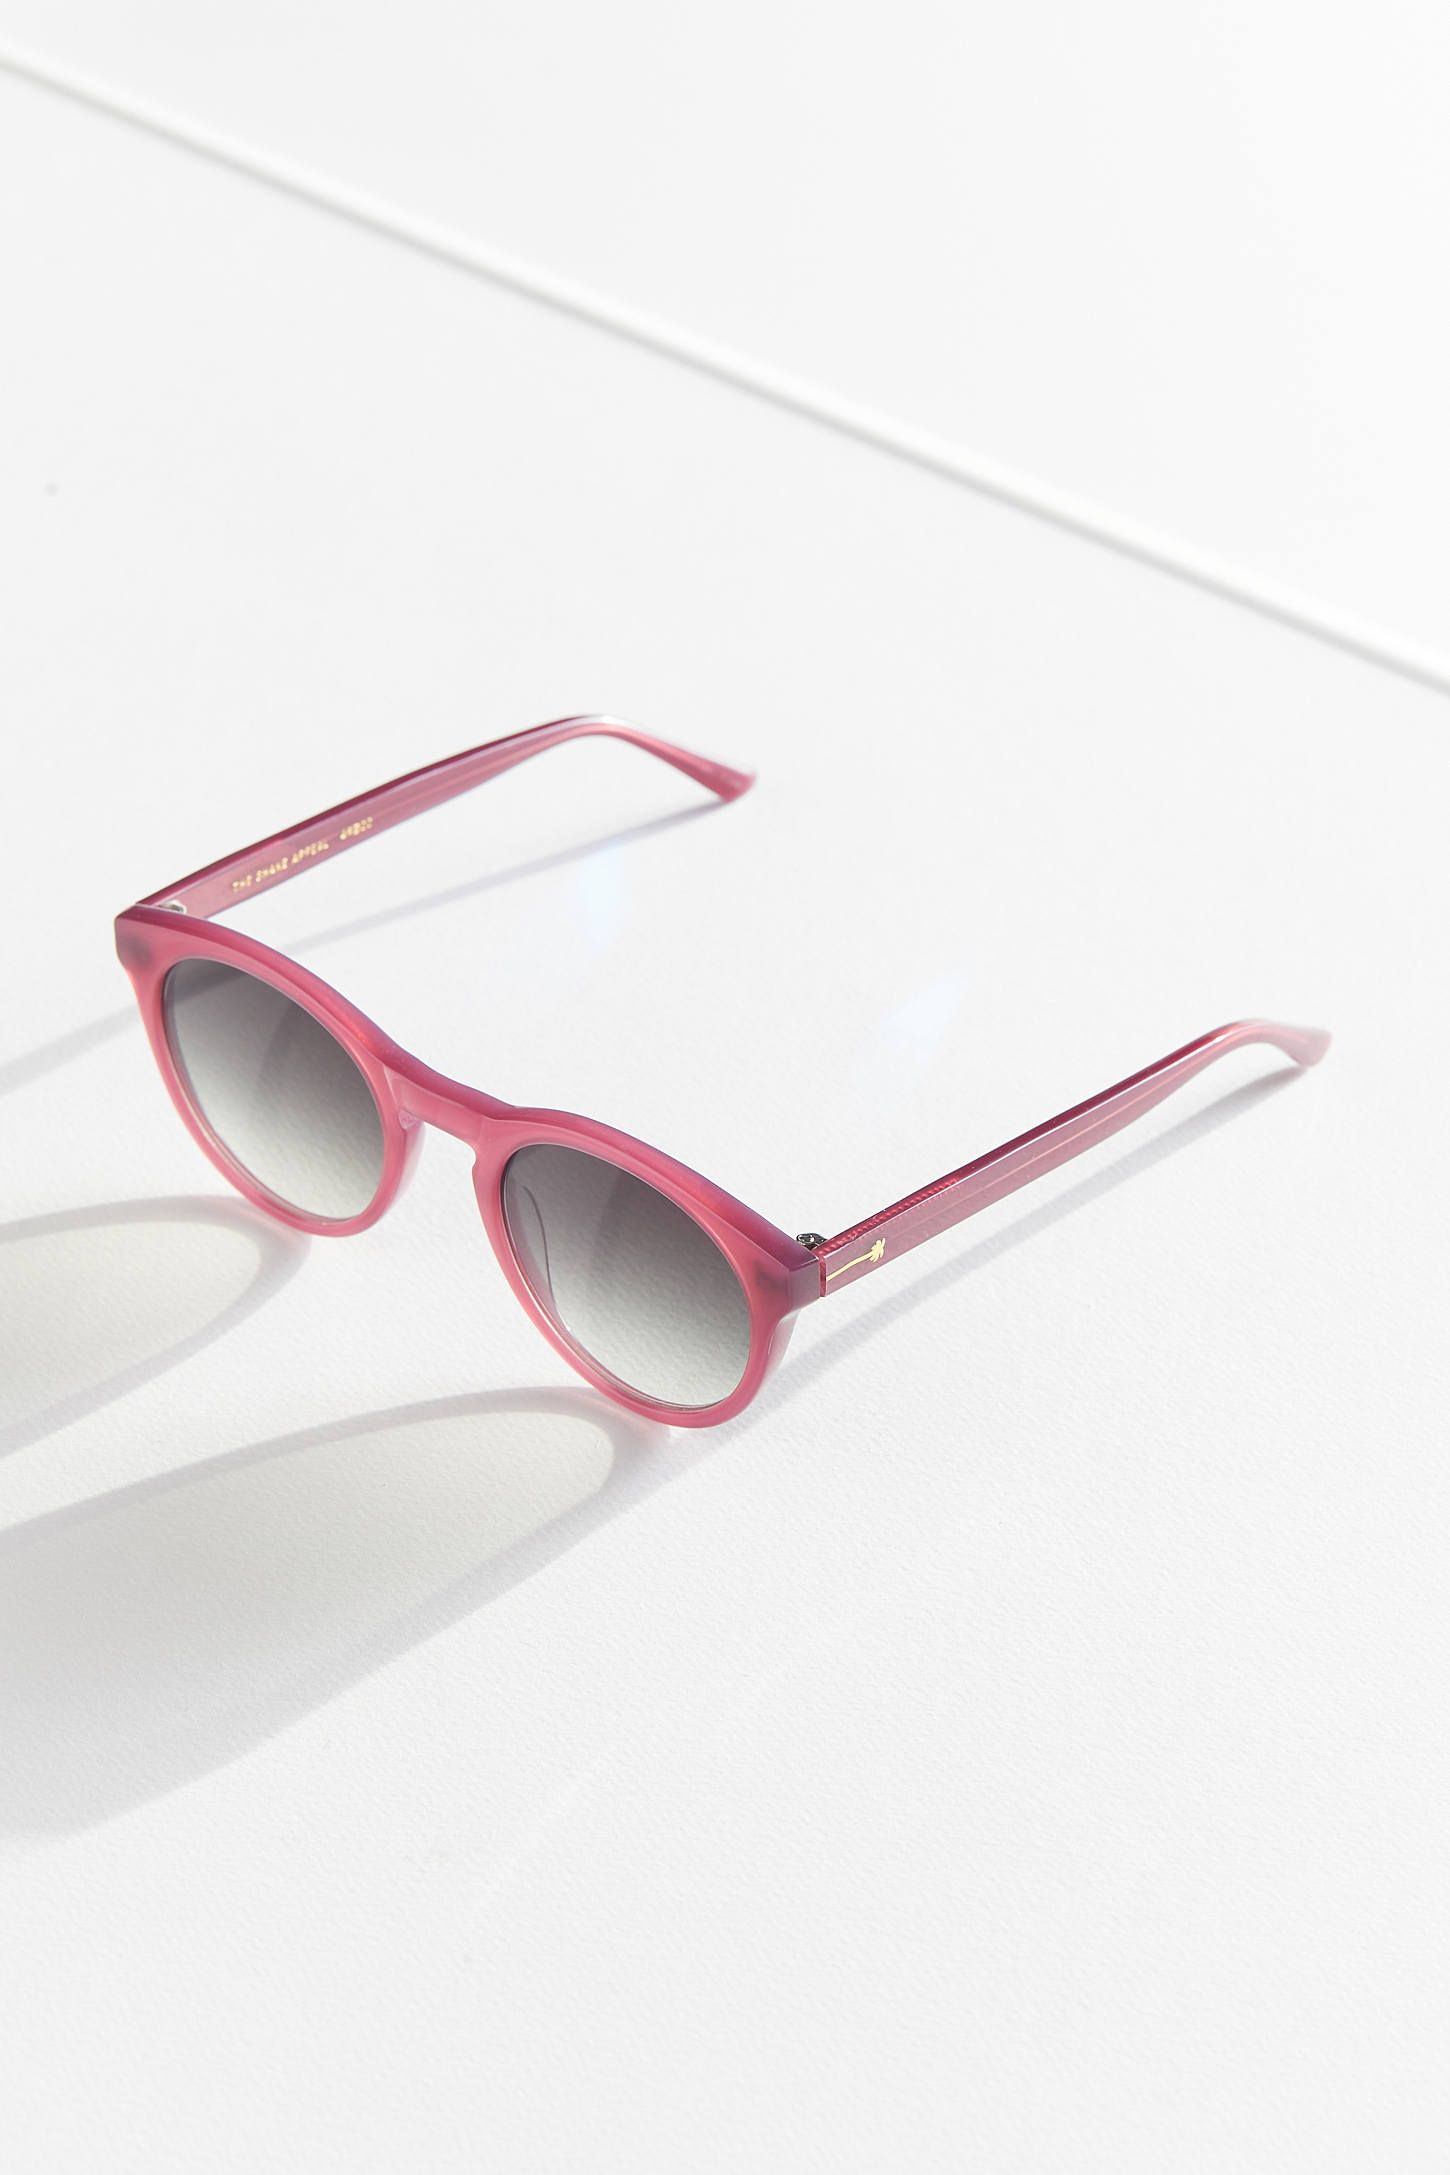 e7db33bc9ae Best sunglasses brands for where to buy new designer sunglasses jpg  1450x2175 Sunglasses trending products for